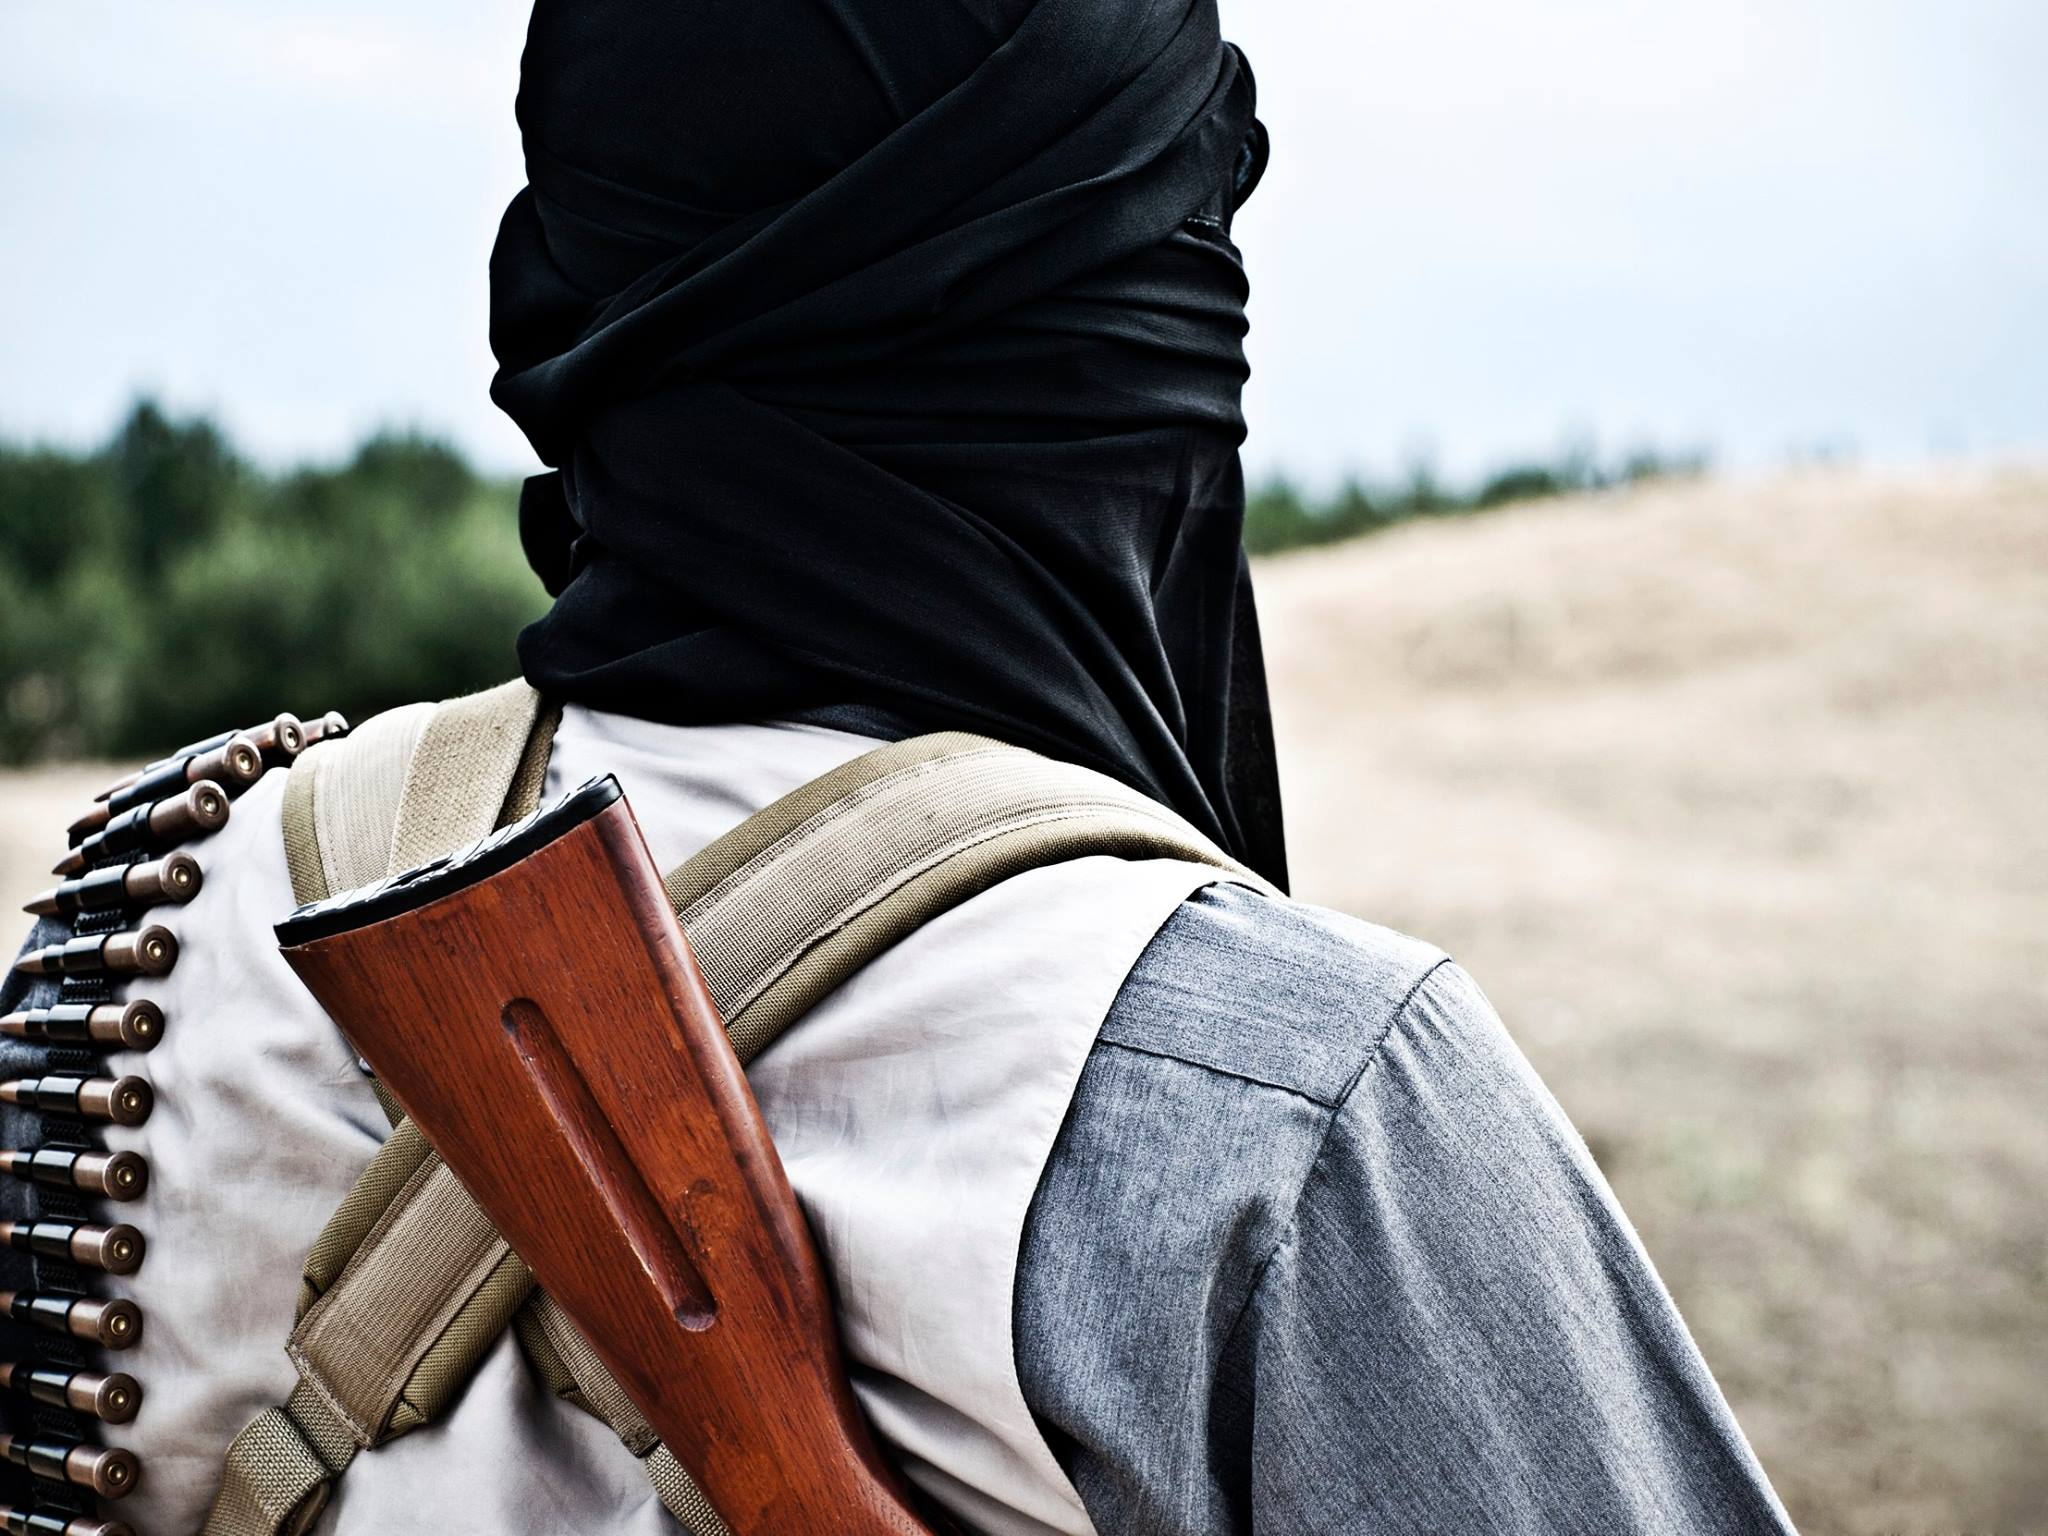 Recent tragedies reveal disturbing trend in Niger